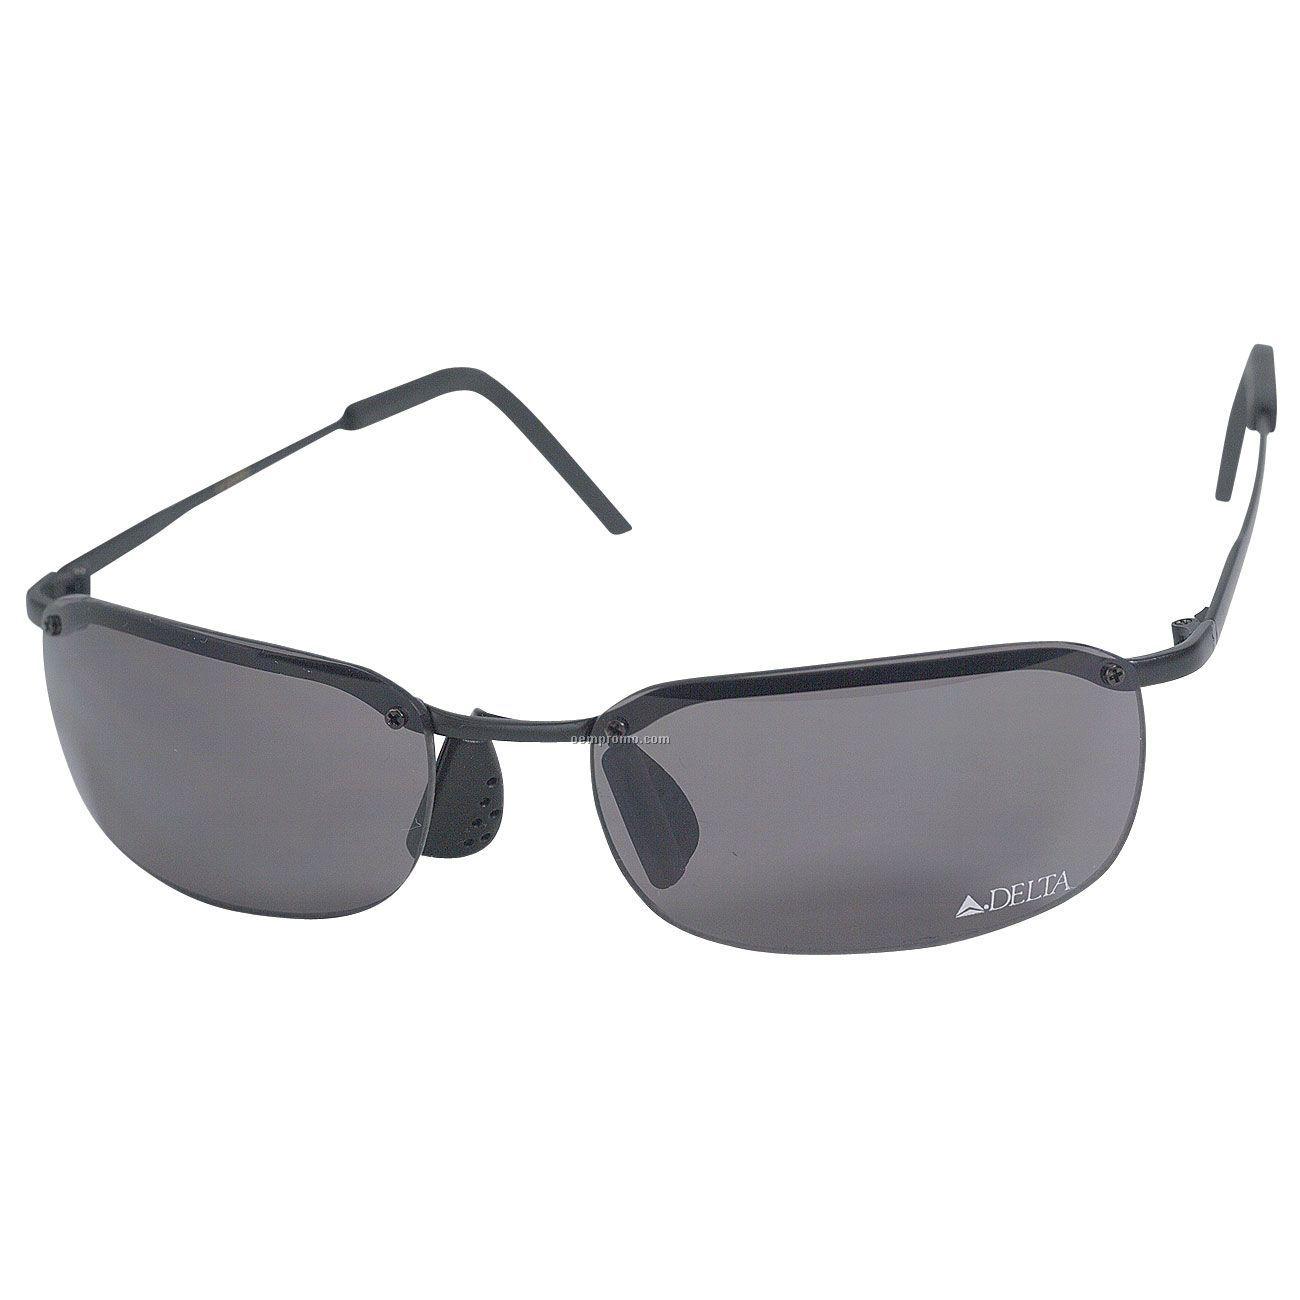 wholesale rimless sunglasses | caba pro bono